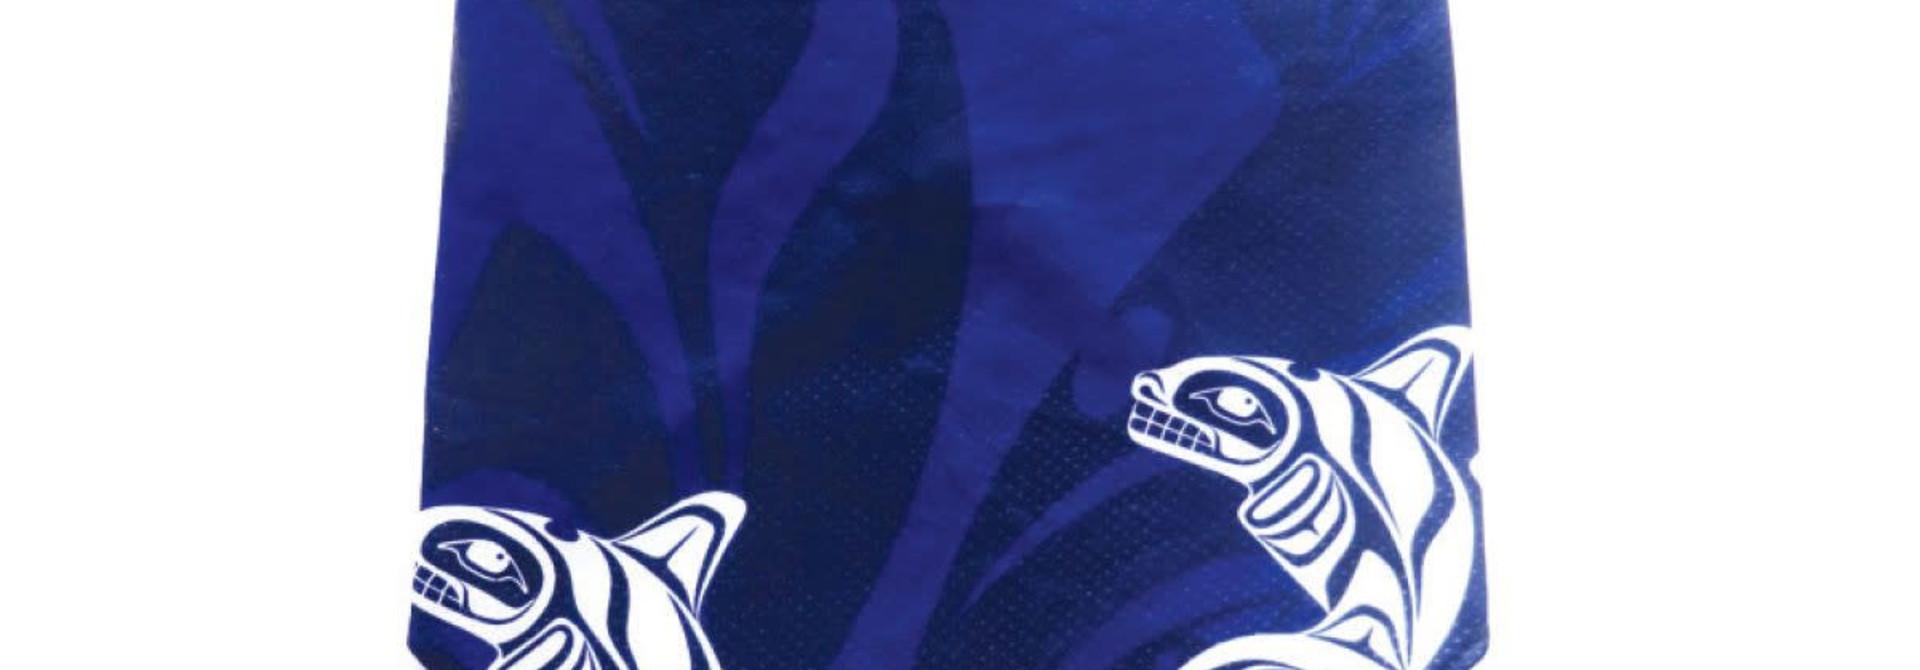 Bandana Gaiter with Ear Loops -Whale by Paul Windsor